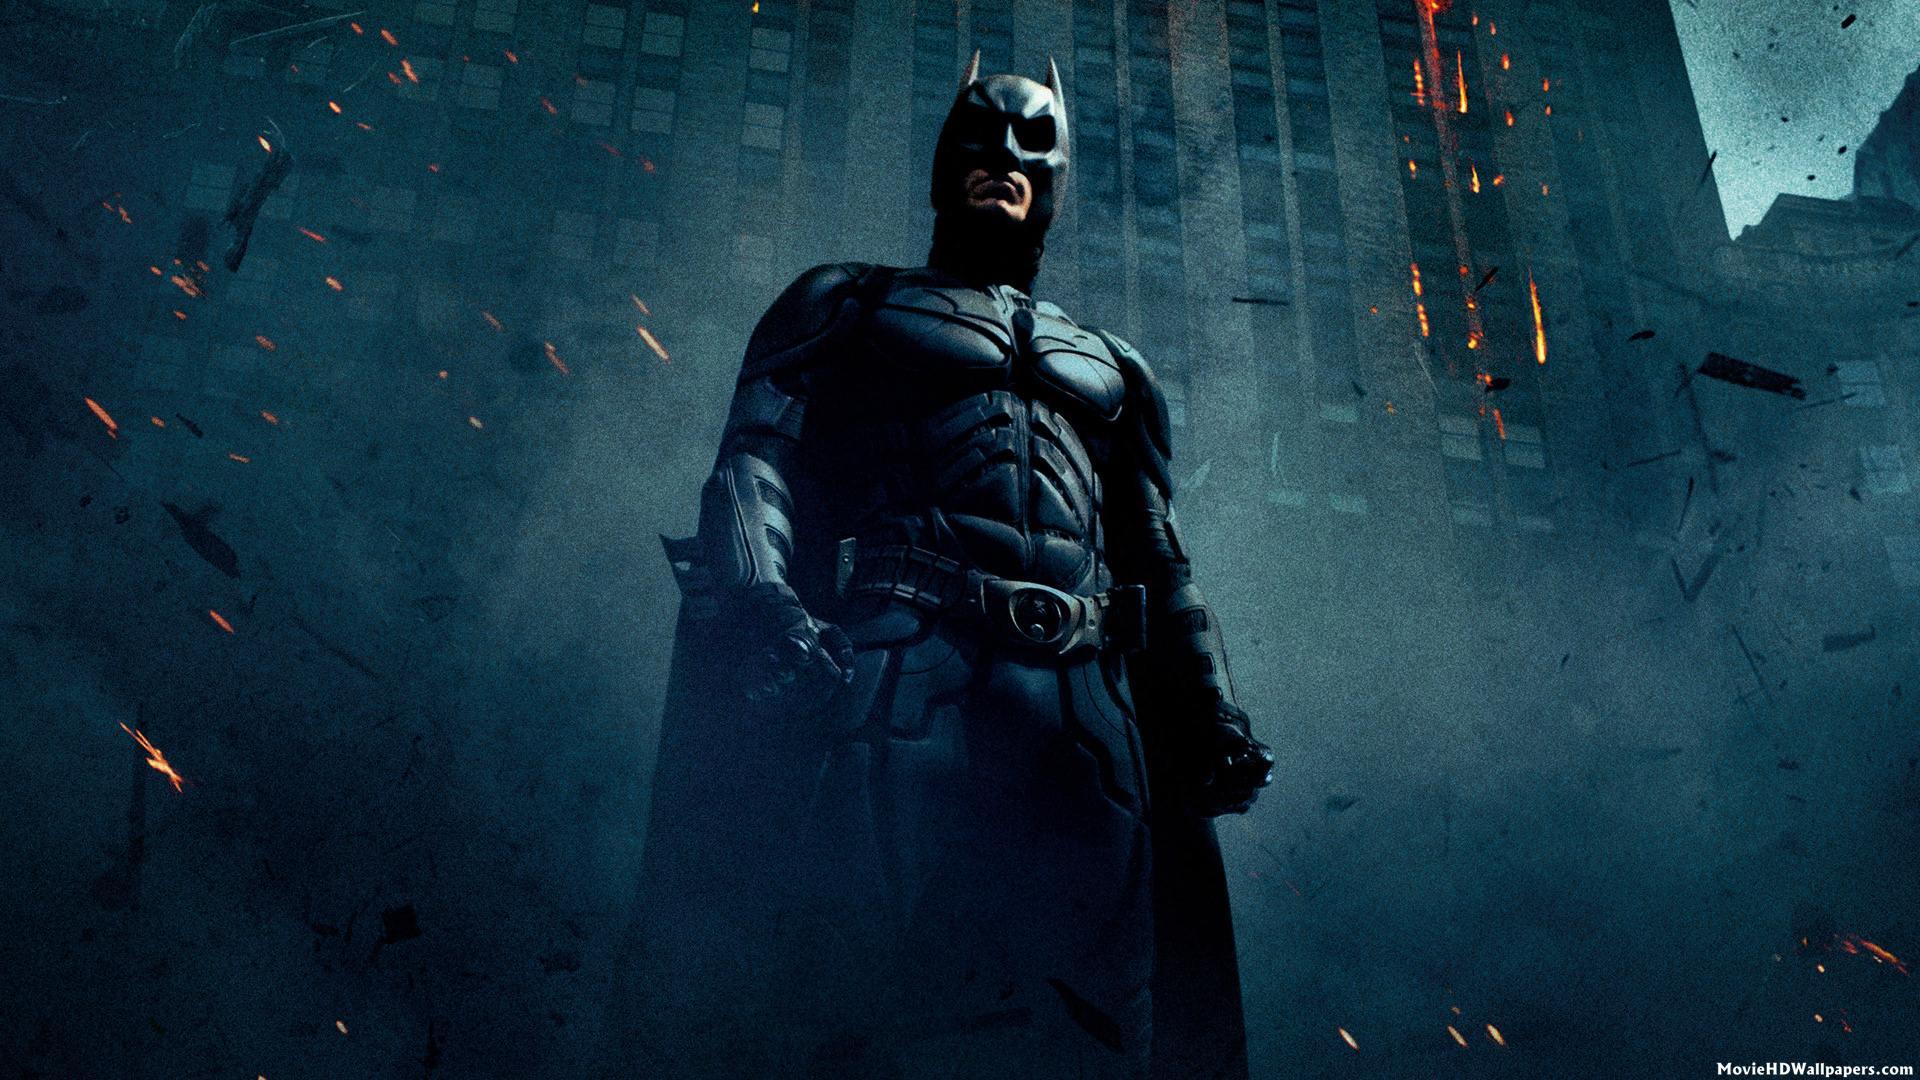 Batman The Dark Knight Wallpapers Hd Resolution We Love Movies